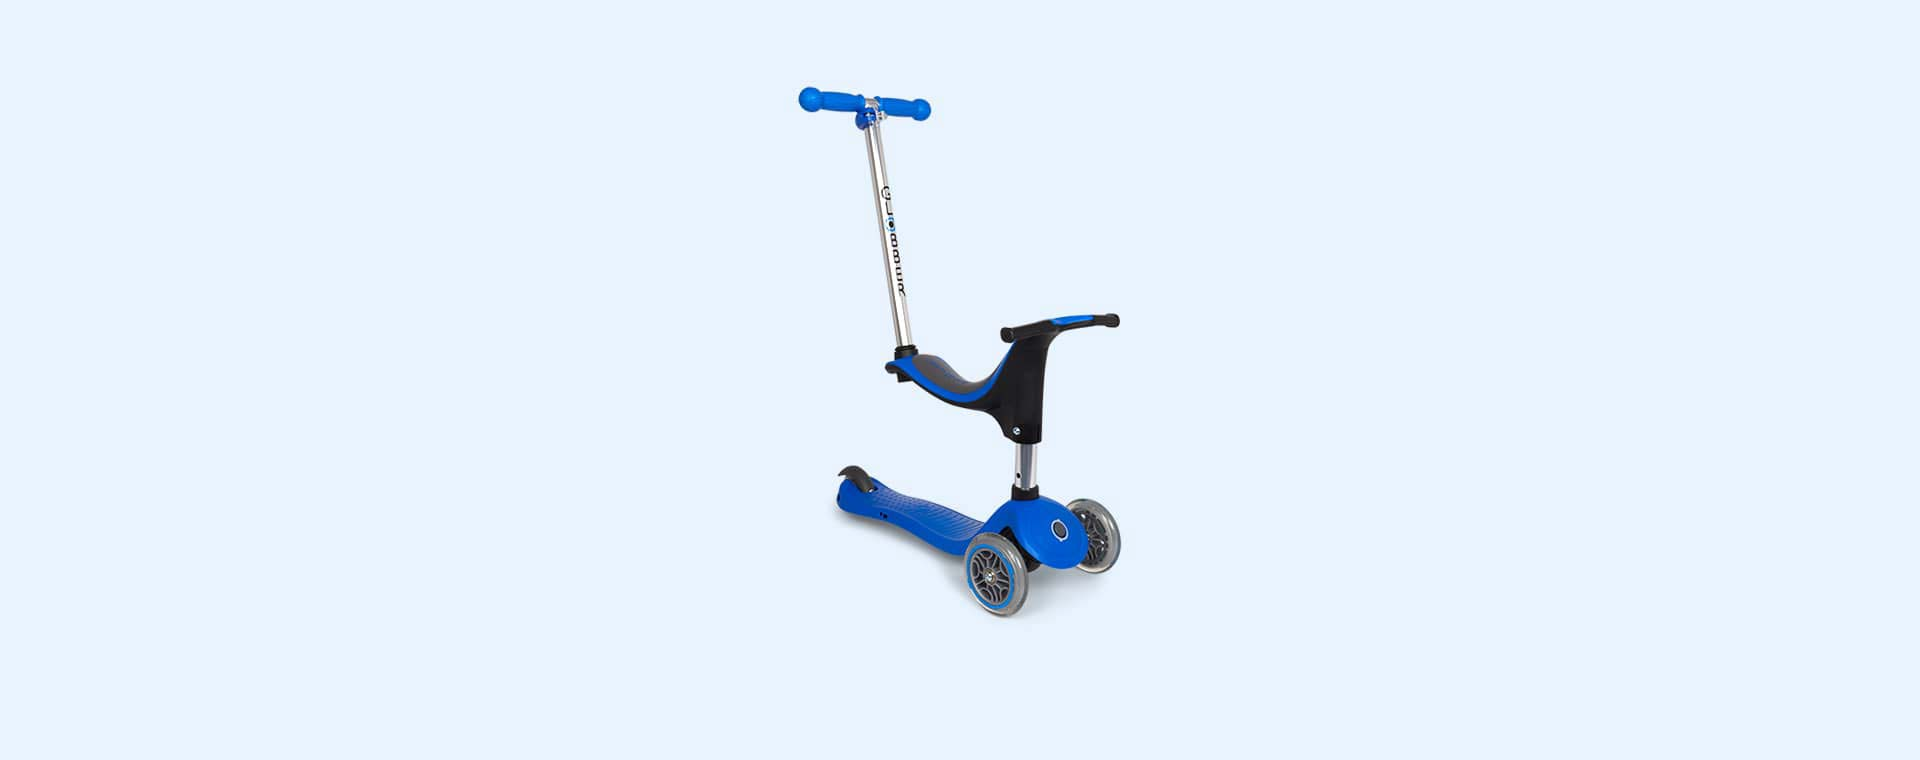 Navy Blue Globber Evo 4-in-1 Scooter